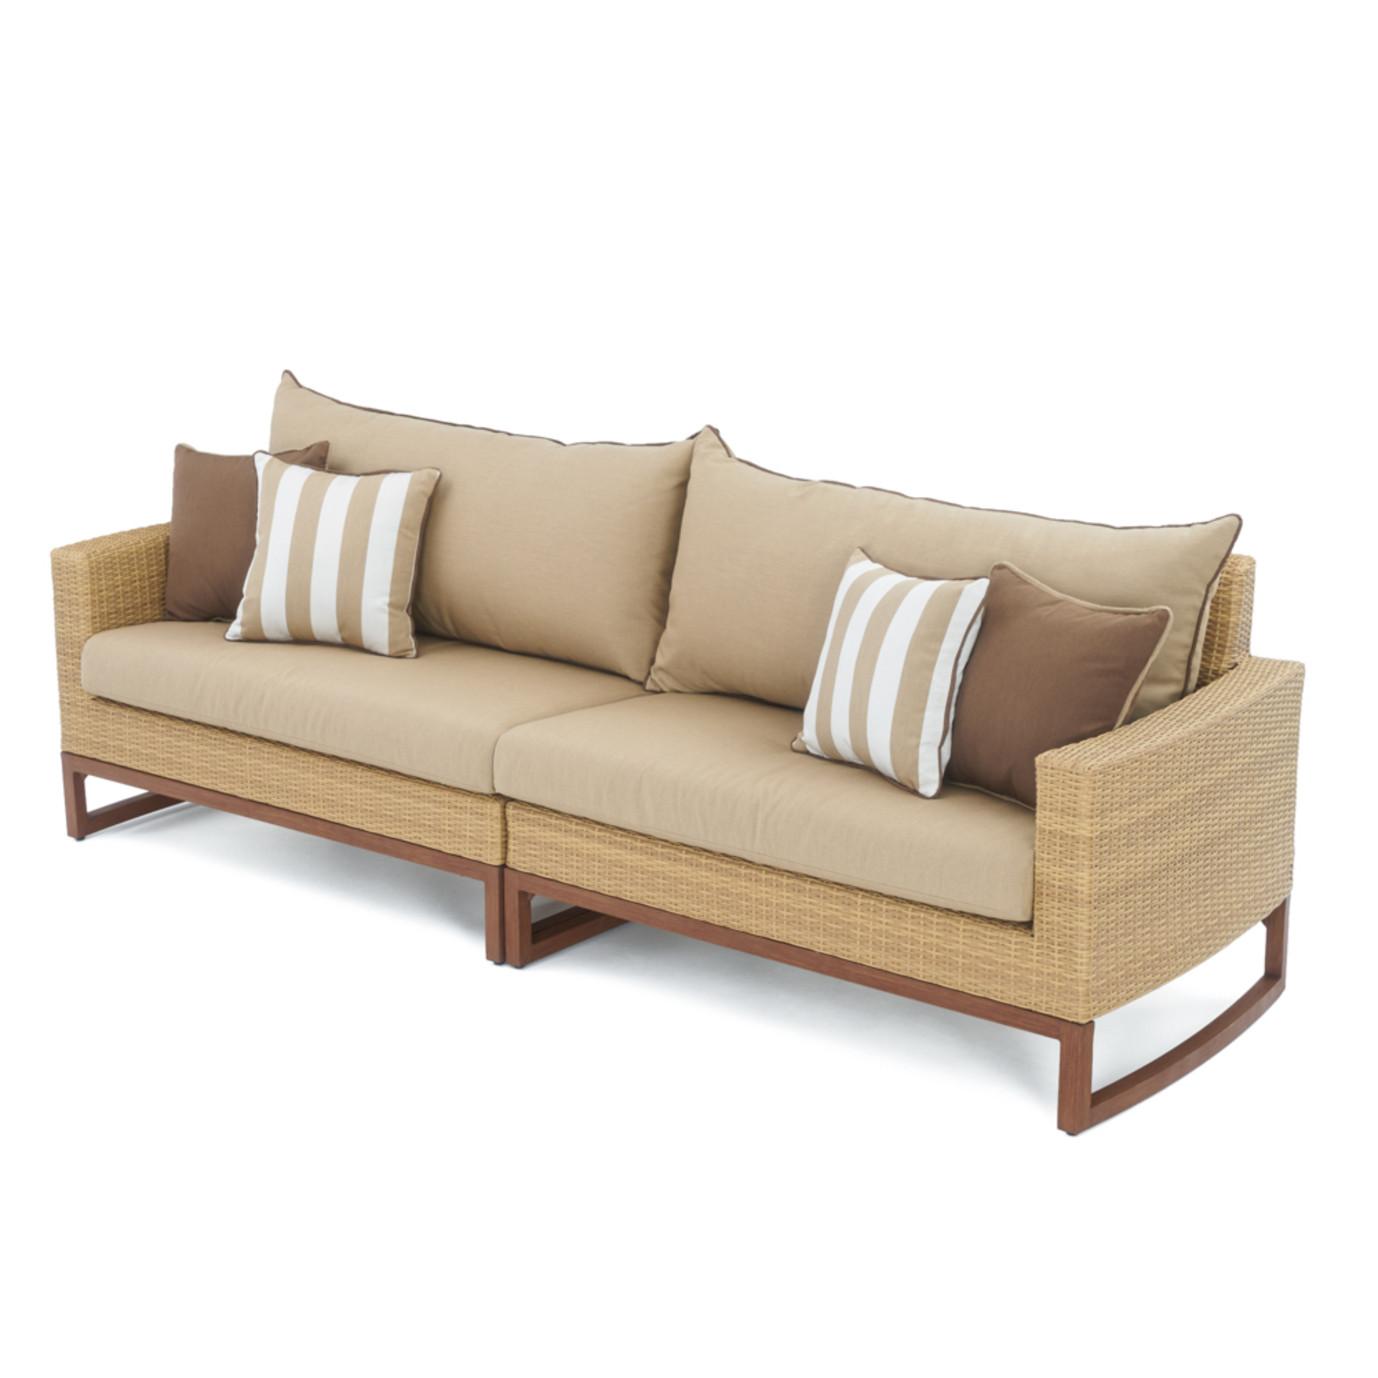 Mili™ 8pc Deep Seating Set - Maxim Beige